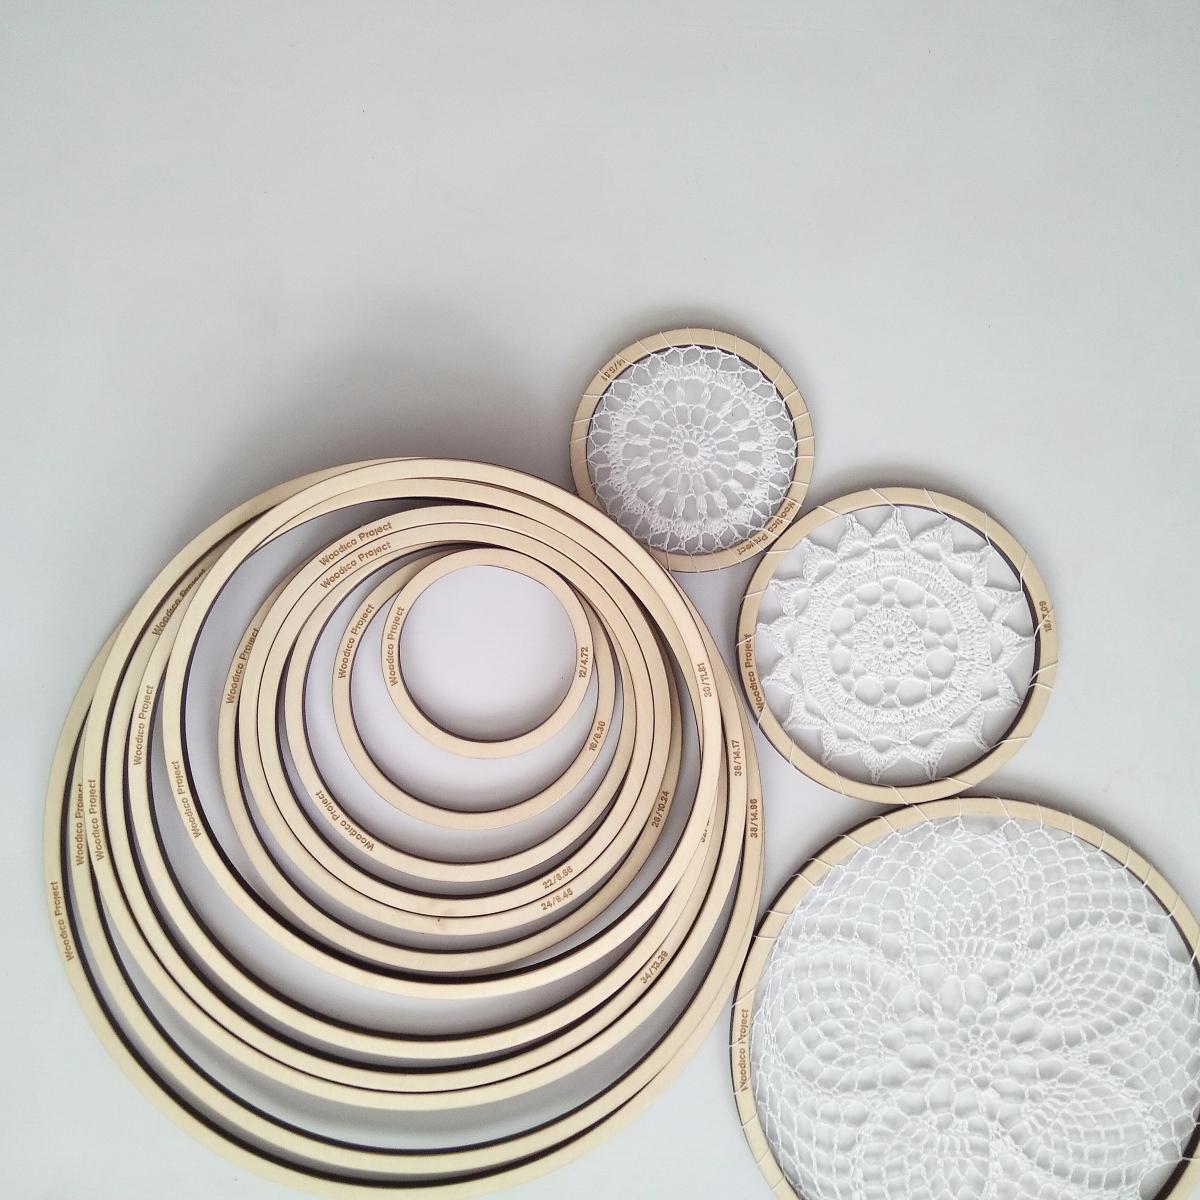 woodico.pro dream catcher base set of 15 rings 12 40 cm 6 1200x1200 - Dream catcher base / Set of 15 rings 12-40 cm